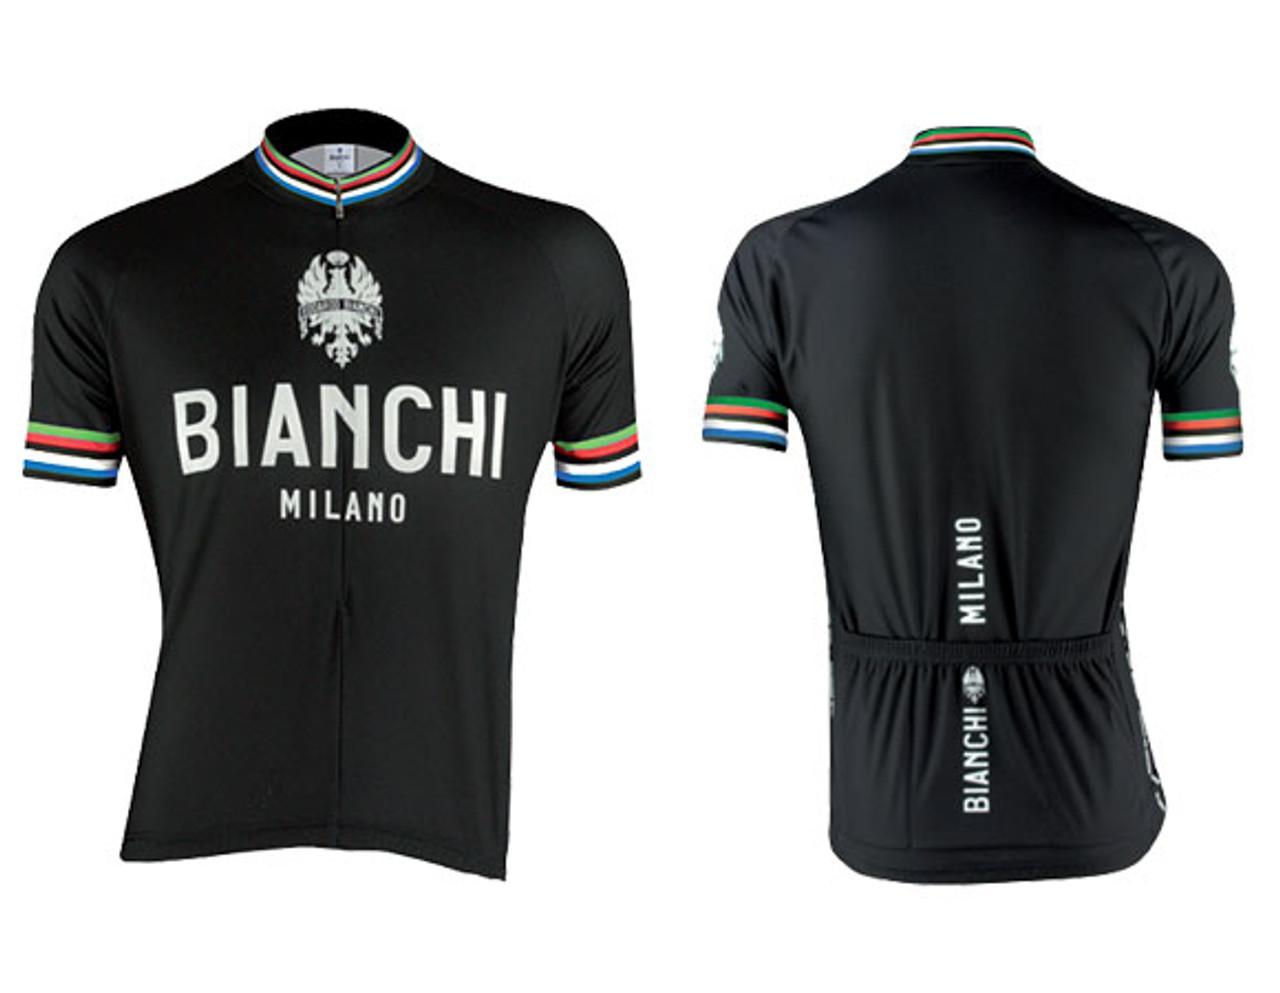 fbc9c0d08 Texas Cyclesport Bianchi Pride Jersey